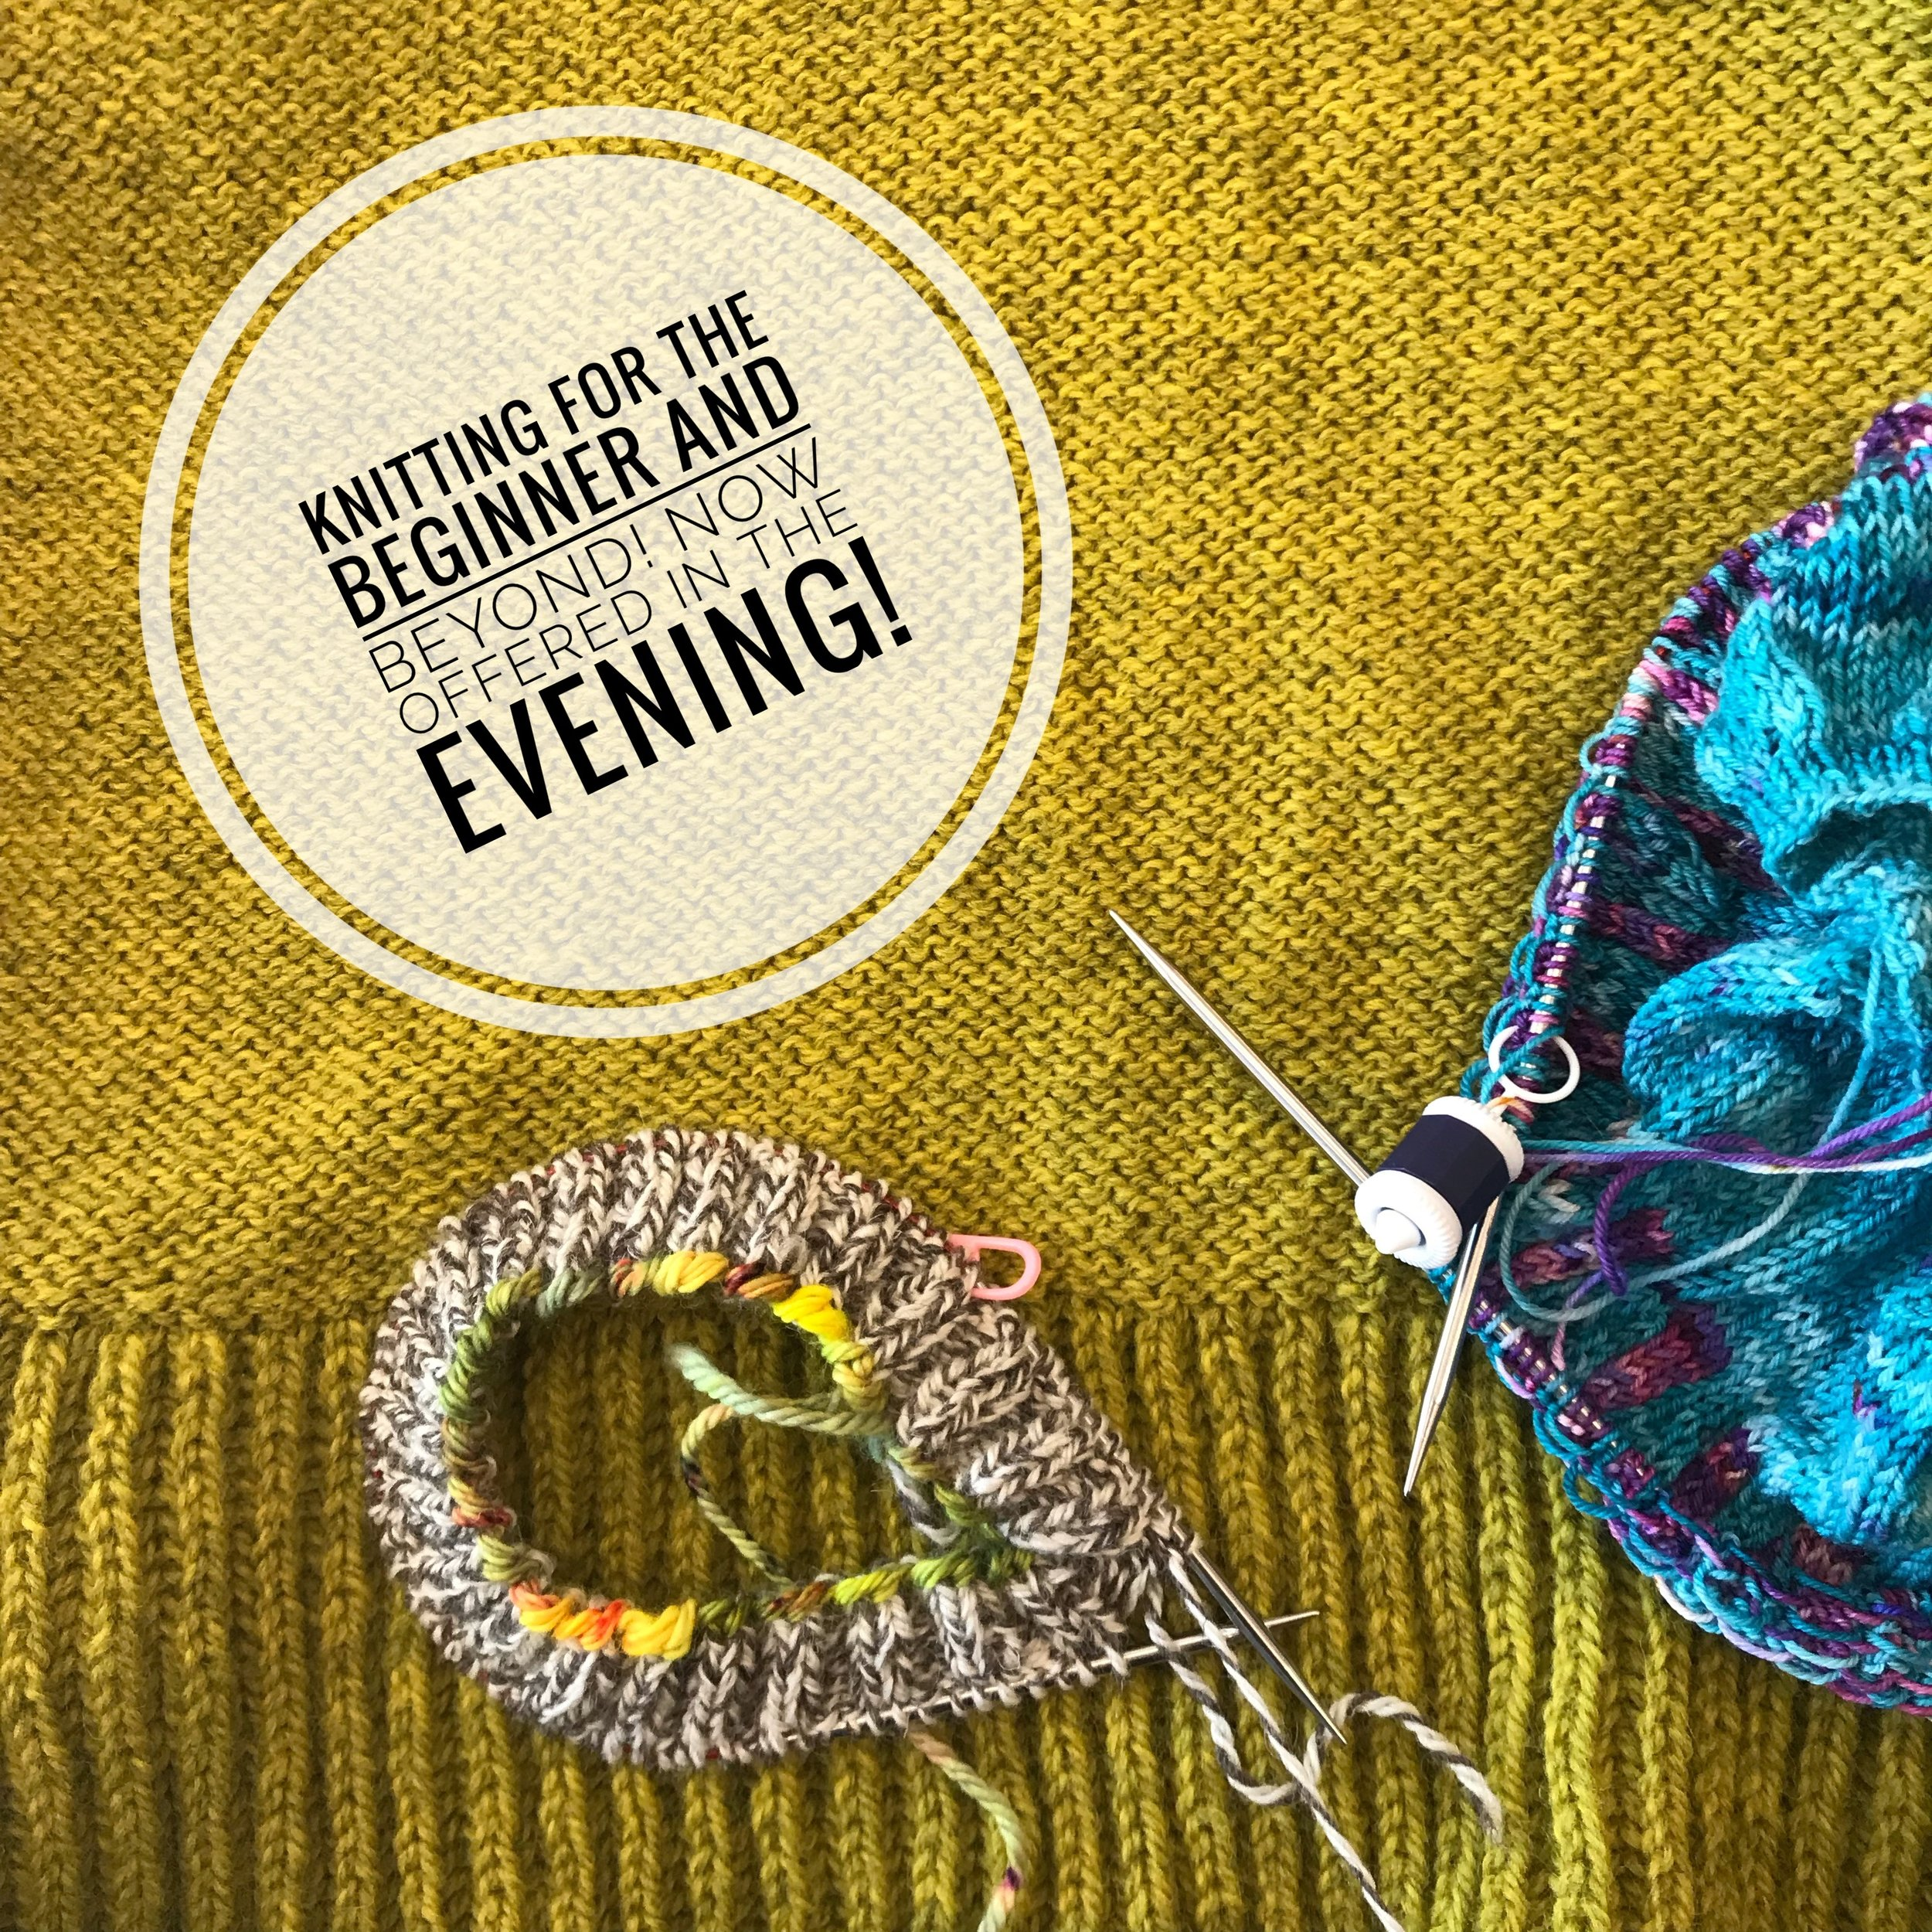 evening knitting bb.jpg